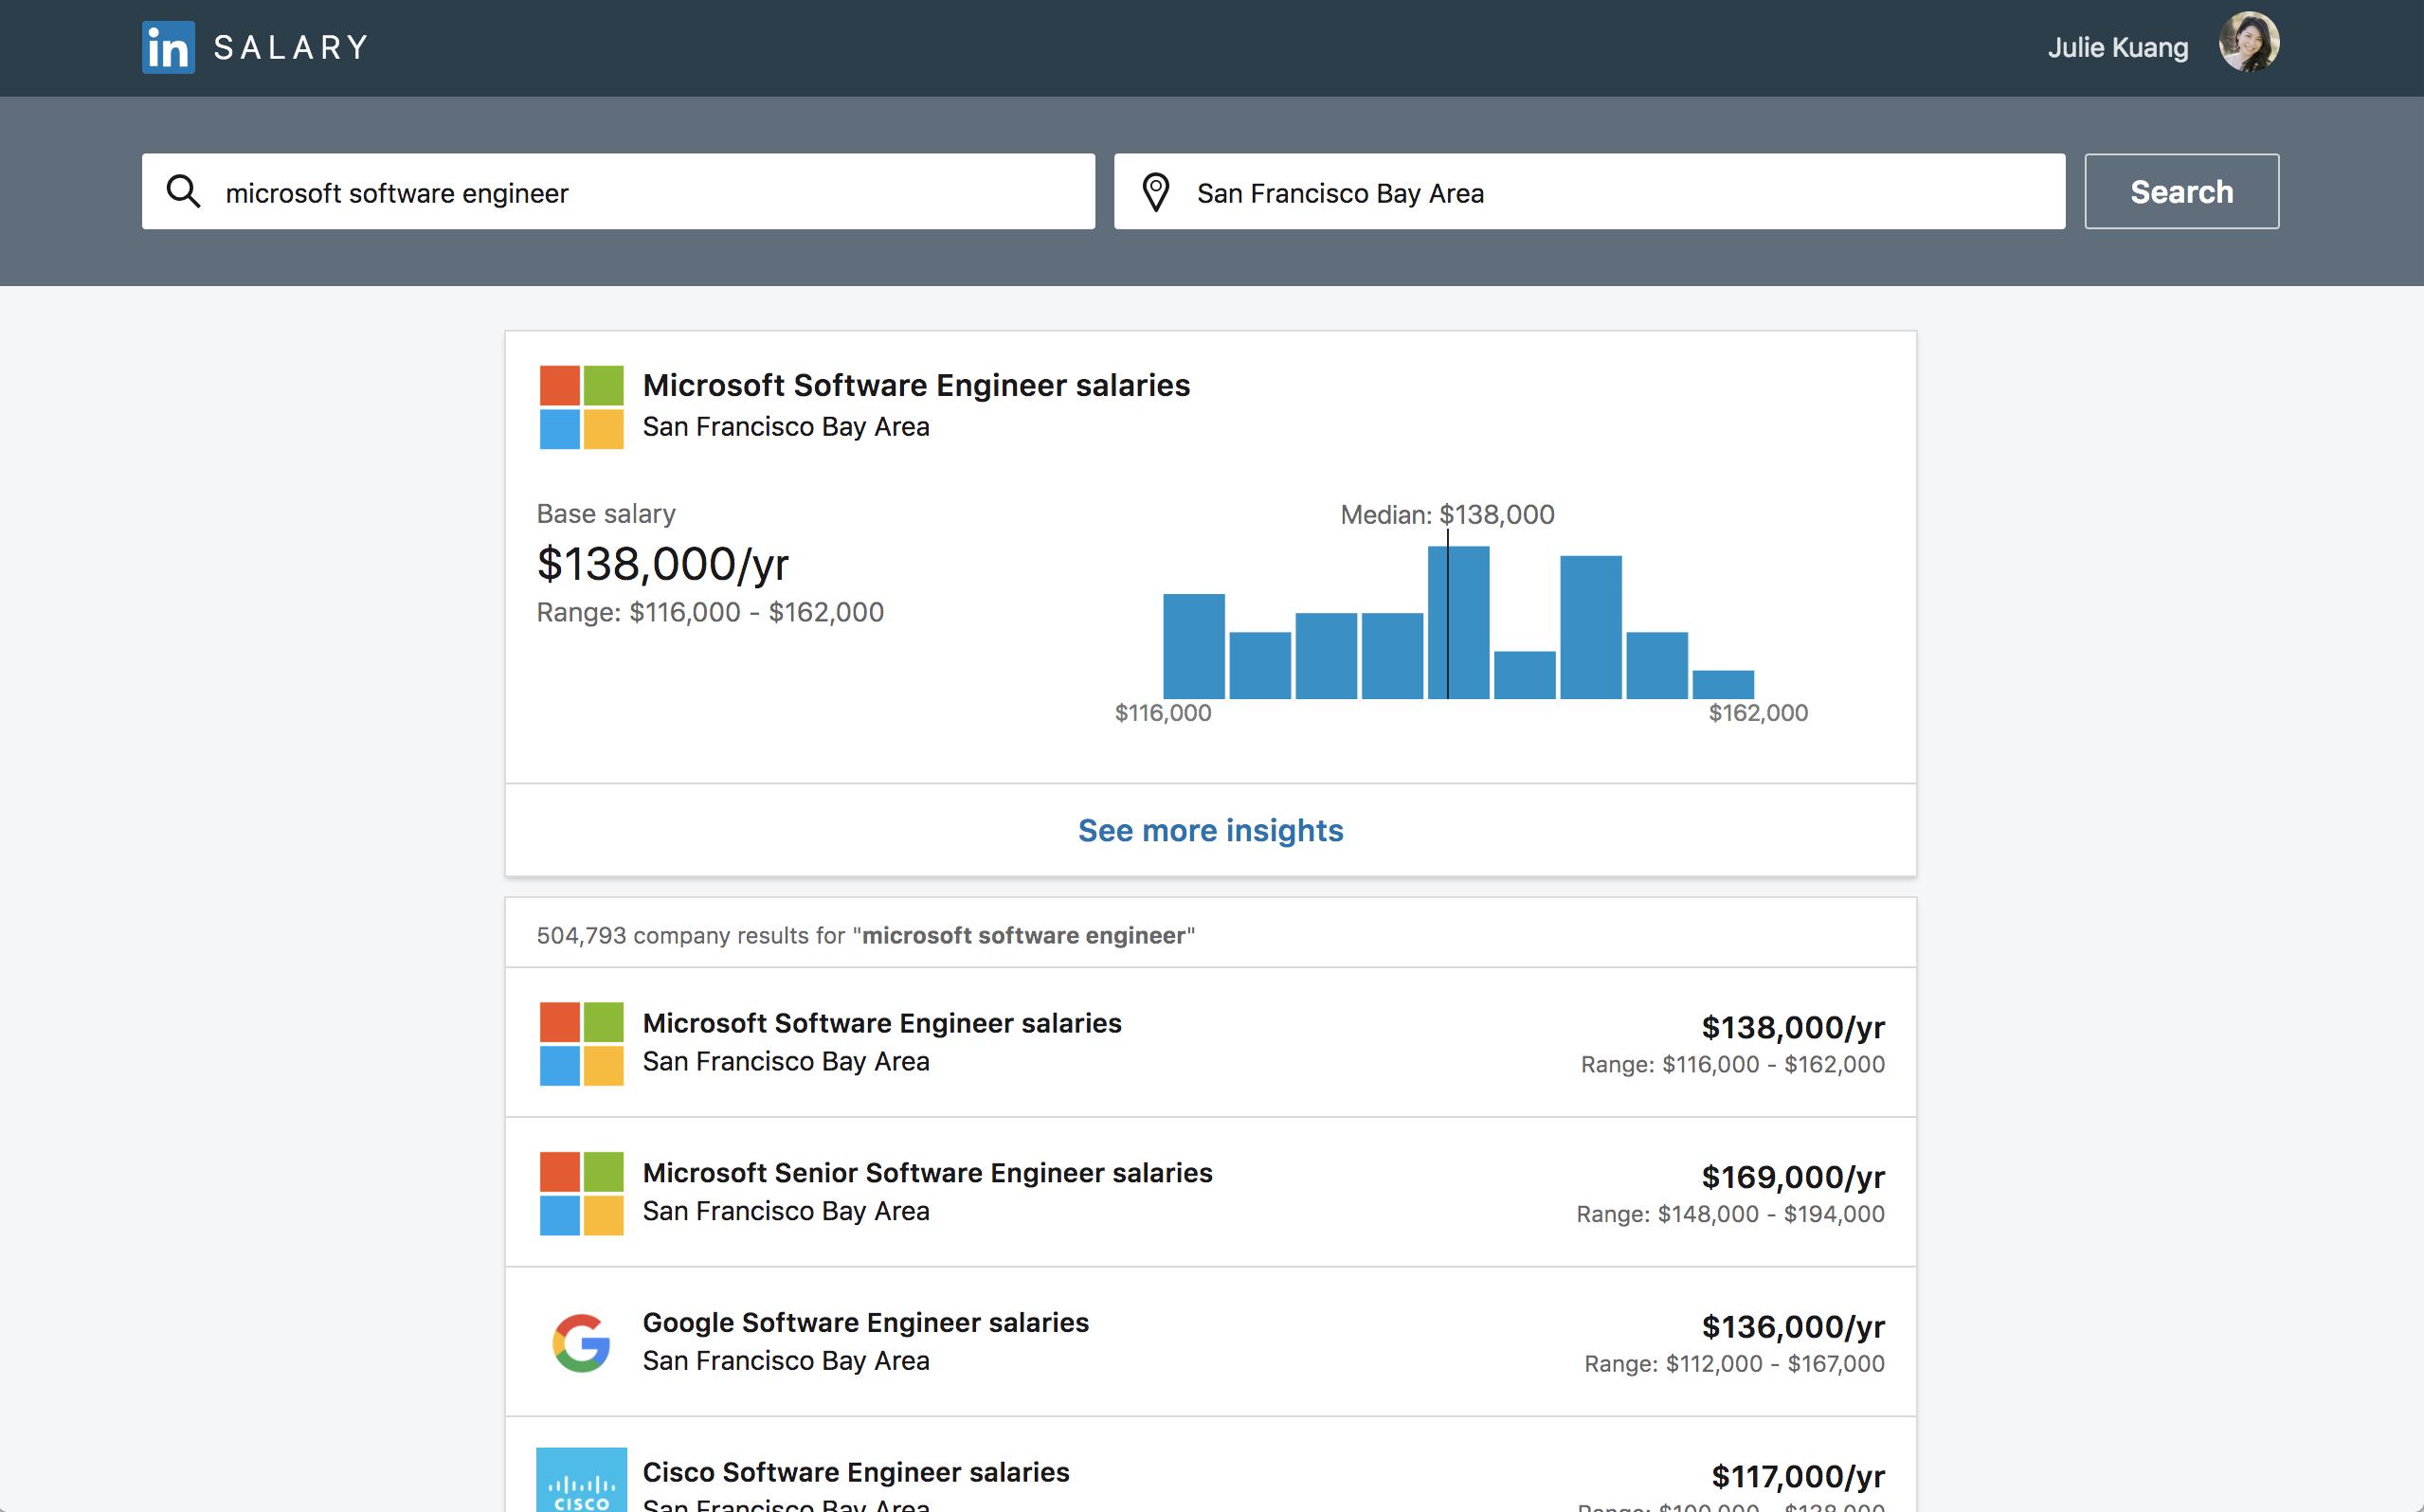 LinkedIn's updates salary insights